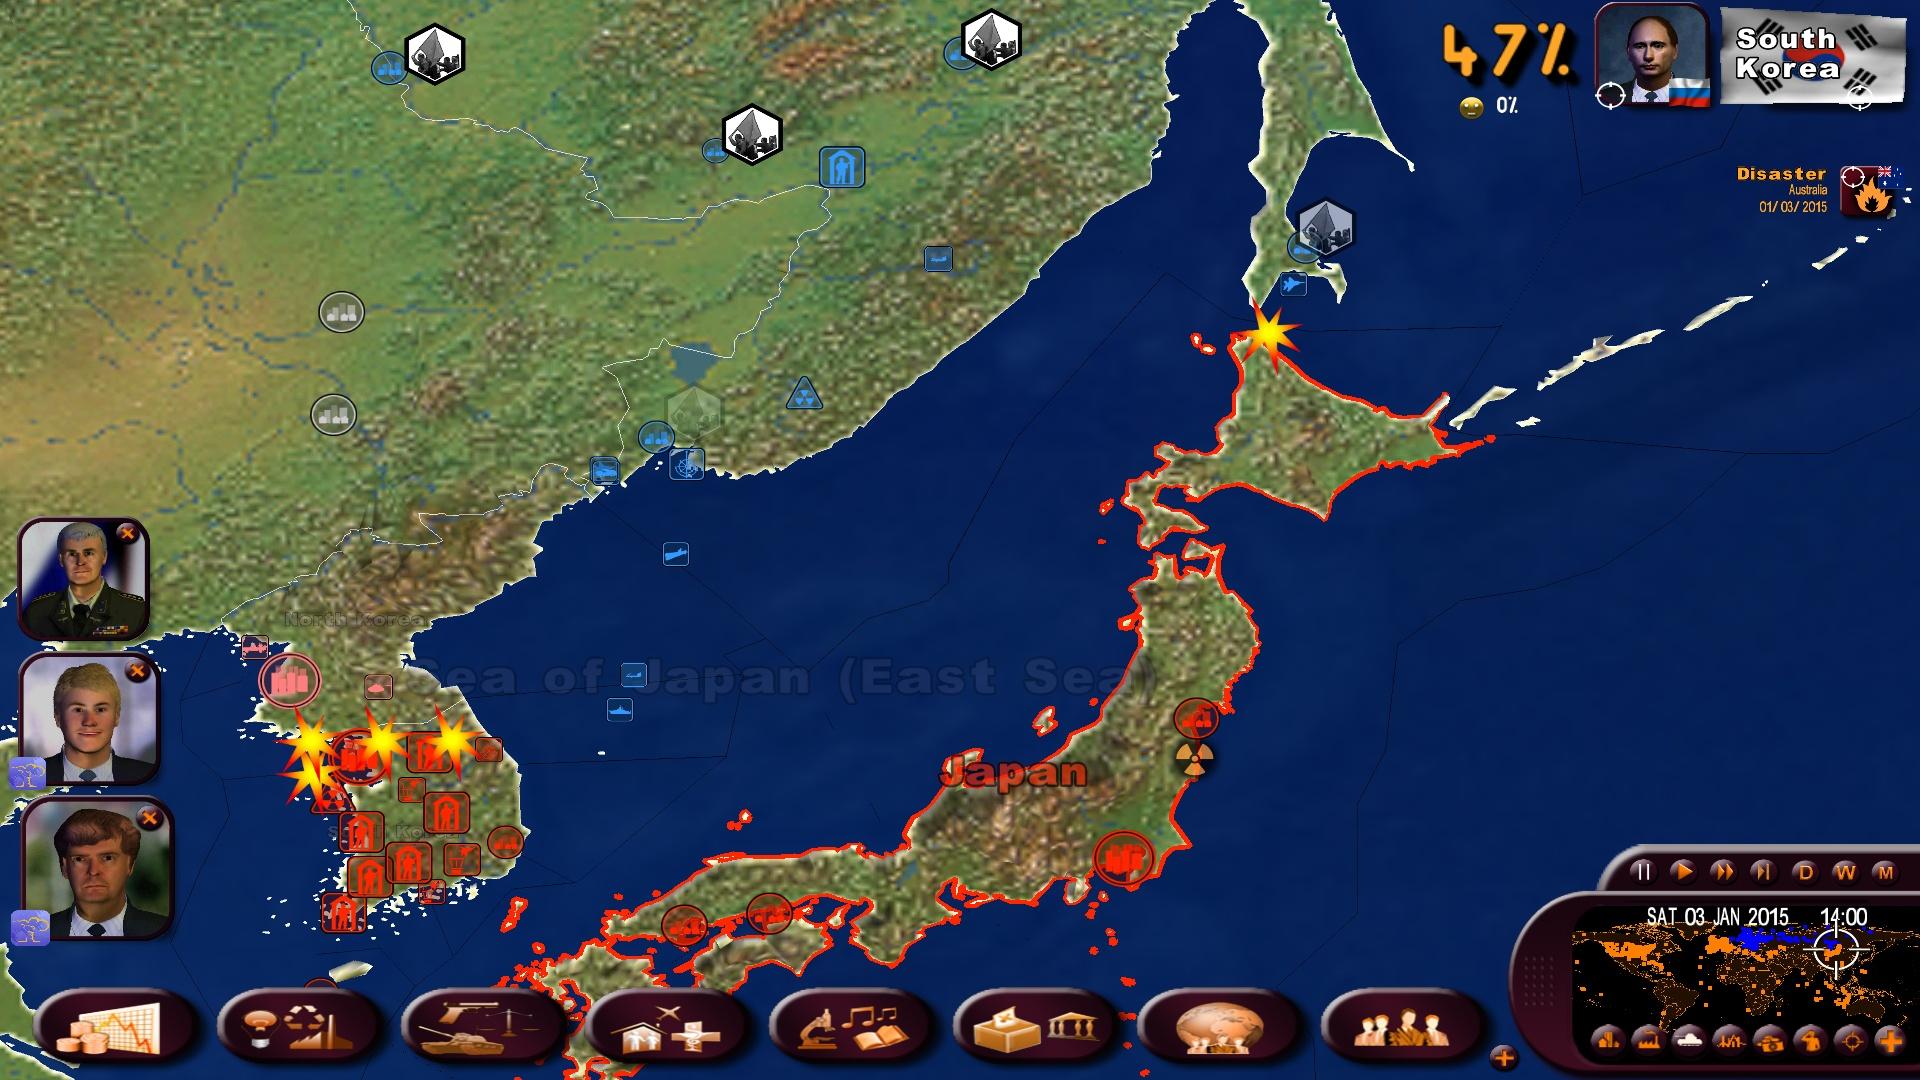 install images aktivacii dlya masters world geopolitical simulator